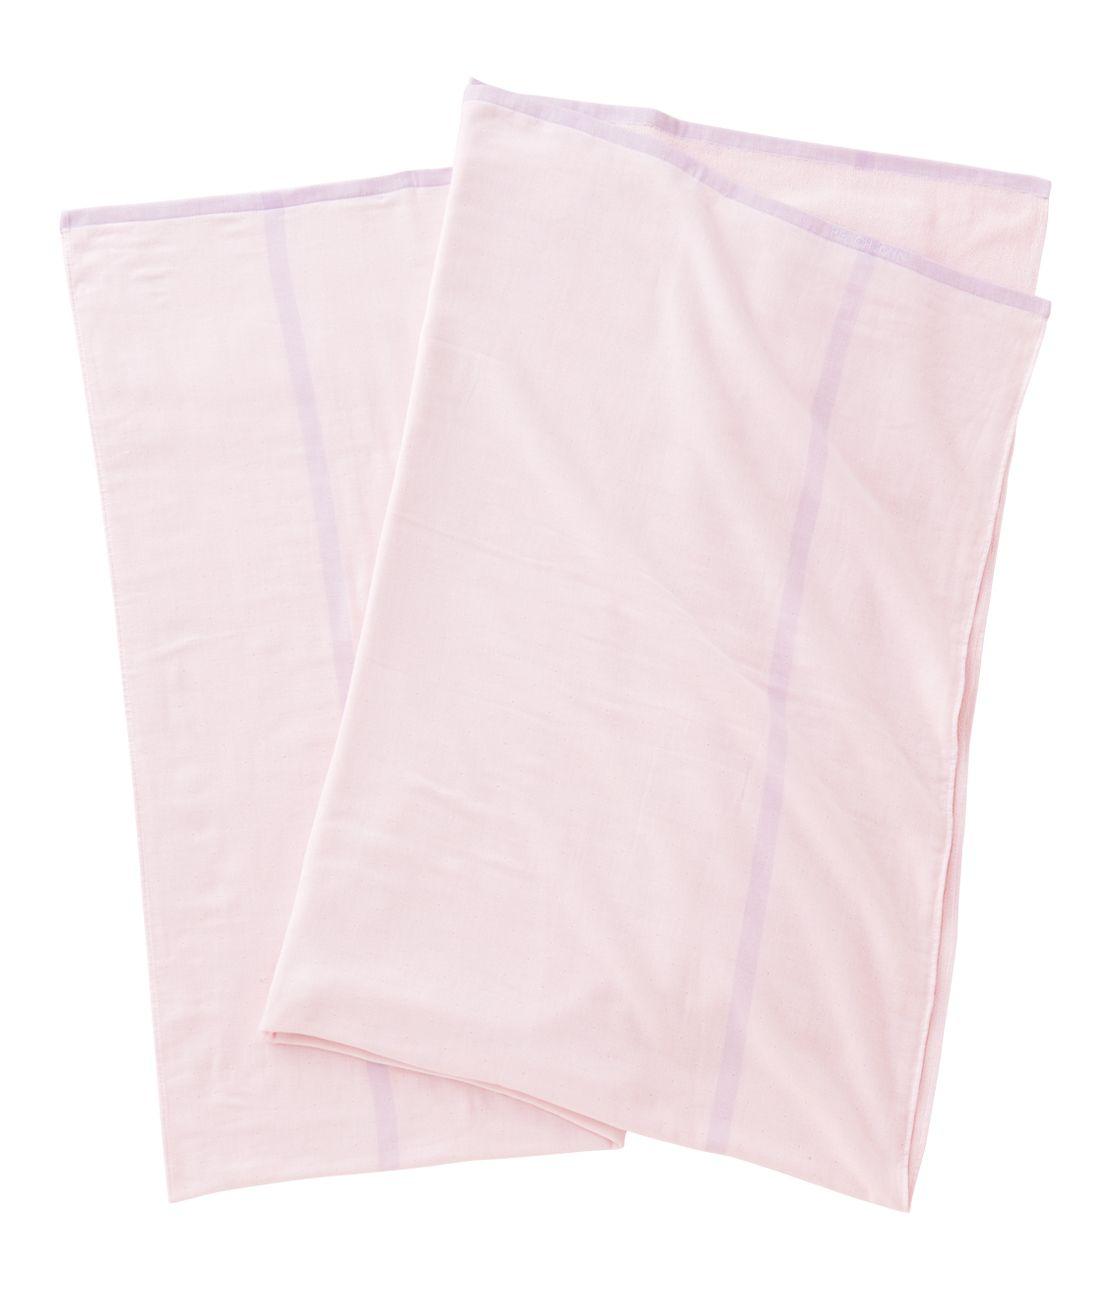 good zzz Hydro silver titanium (R) towel